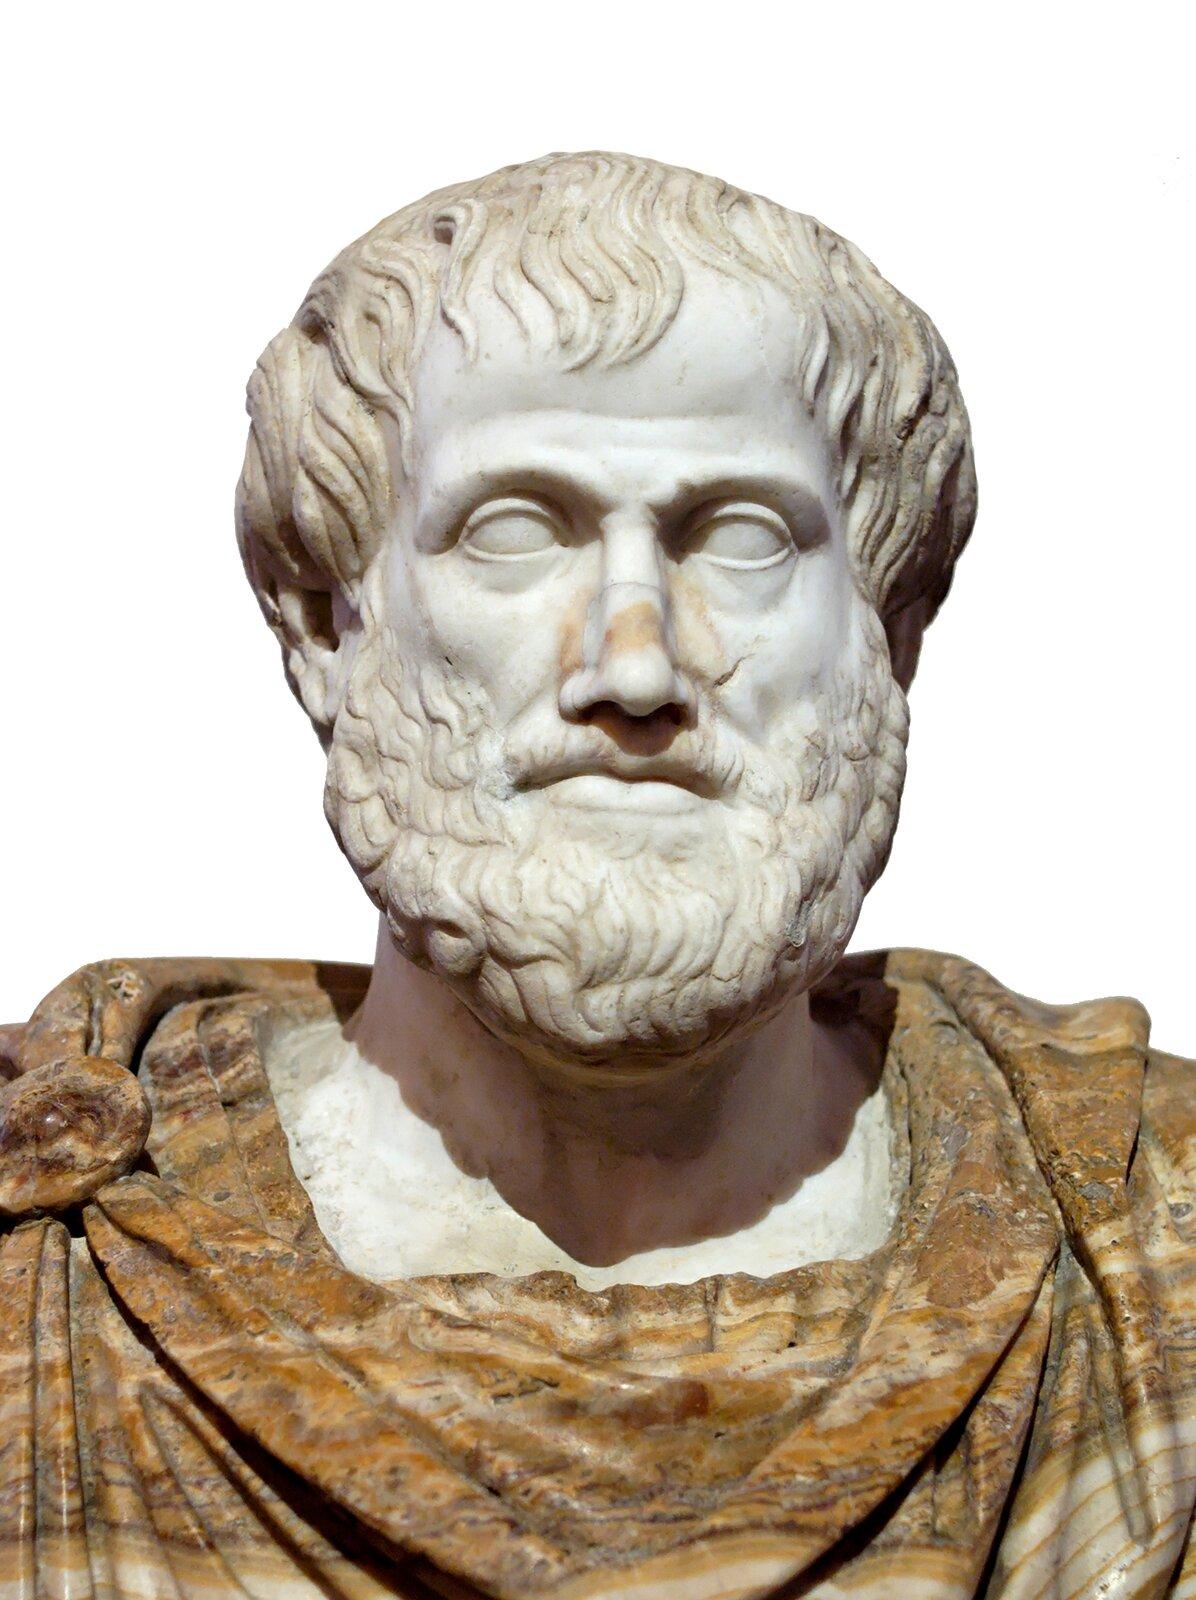 Popiersie Arystotelesa (kopia) Popiersie Arystotelesa (kopia) Źródło: Lysippus, ok. 330 p.n.e, rzeźba, Museo nazionale romano di palazzo Altemps, domena publiczna.